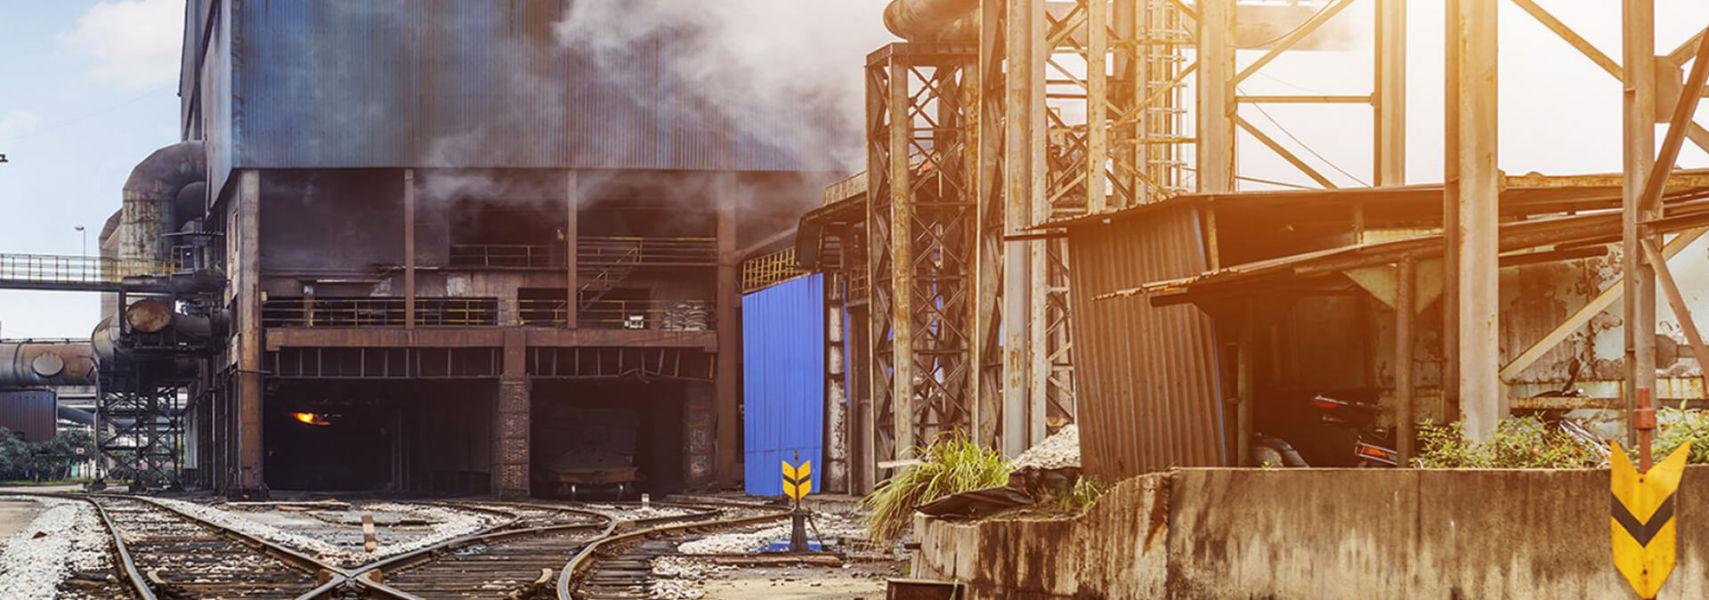 Industrials Header Image